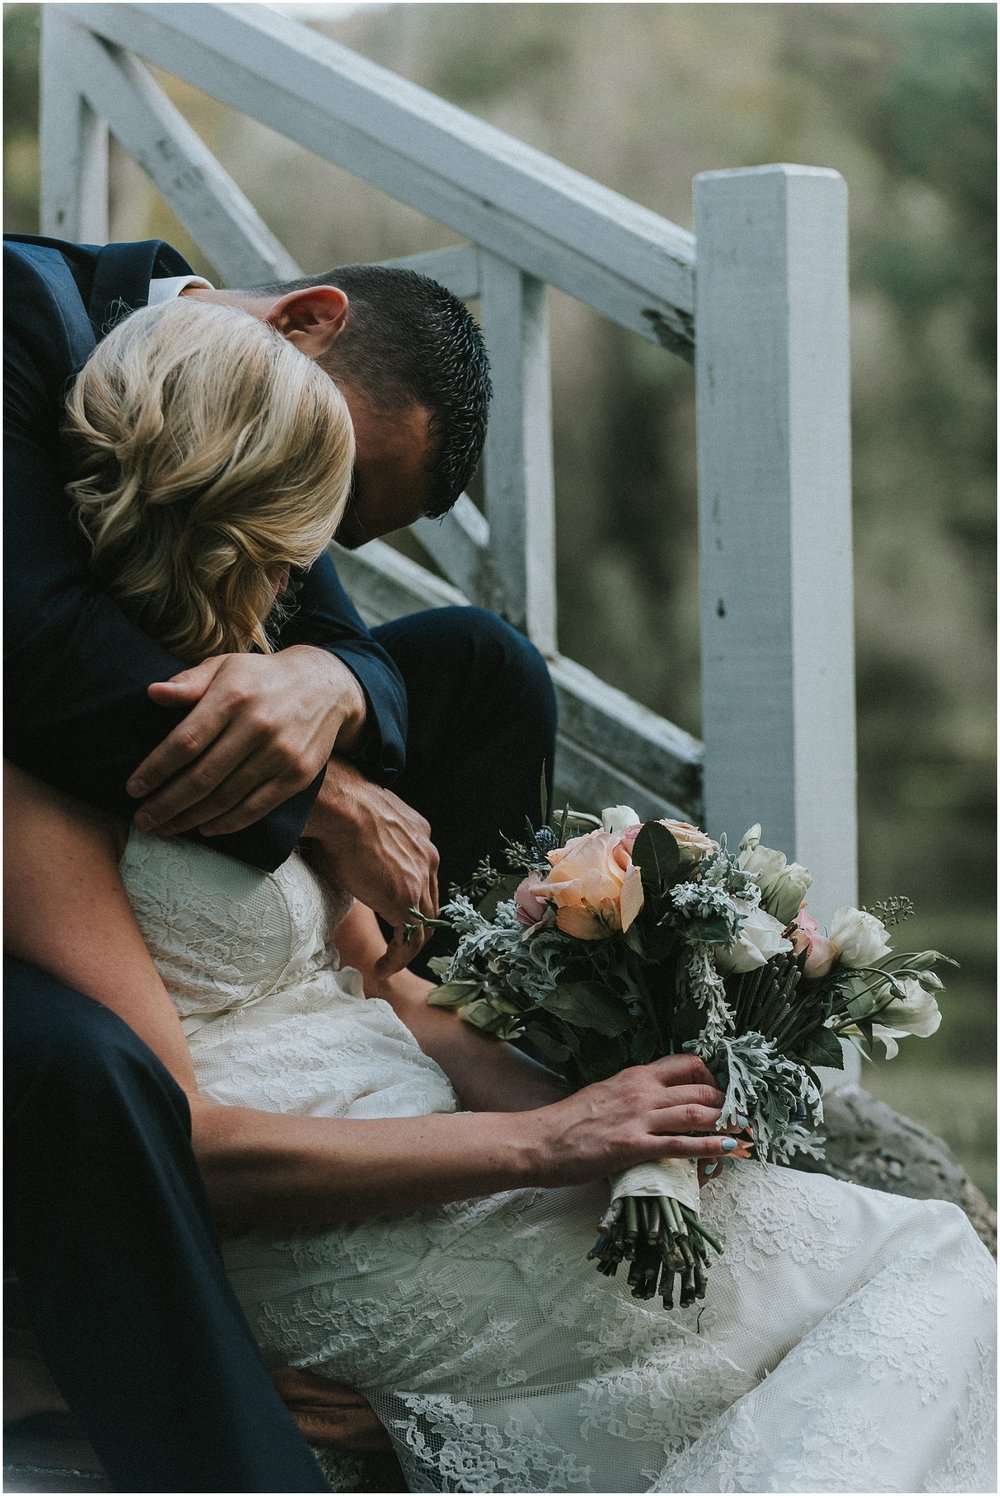 waterloo-village-waterloo village-wedding-outdoor wedding-rustic-boemian-new jersey-bride-groom-wedding party-davids bridal-wedding dress-wedding-first kiss-intimate wedding_0371.jpg